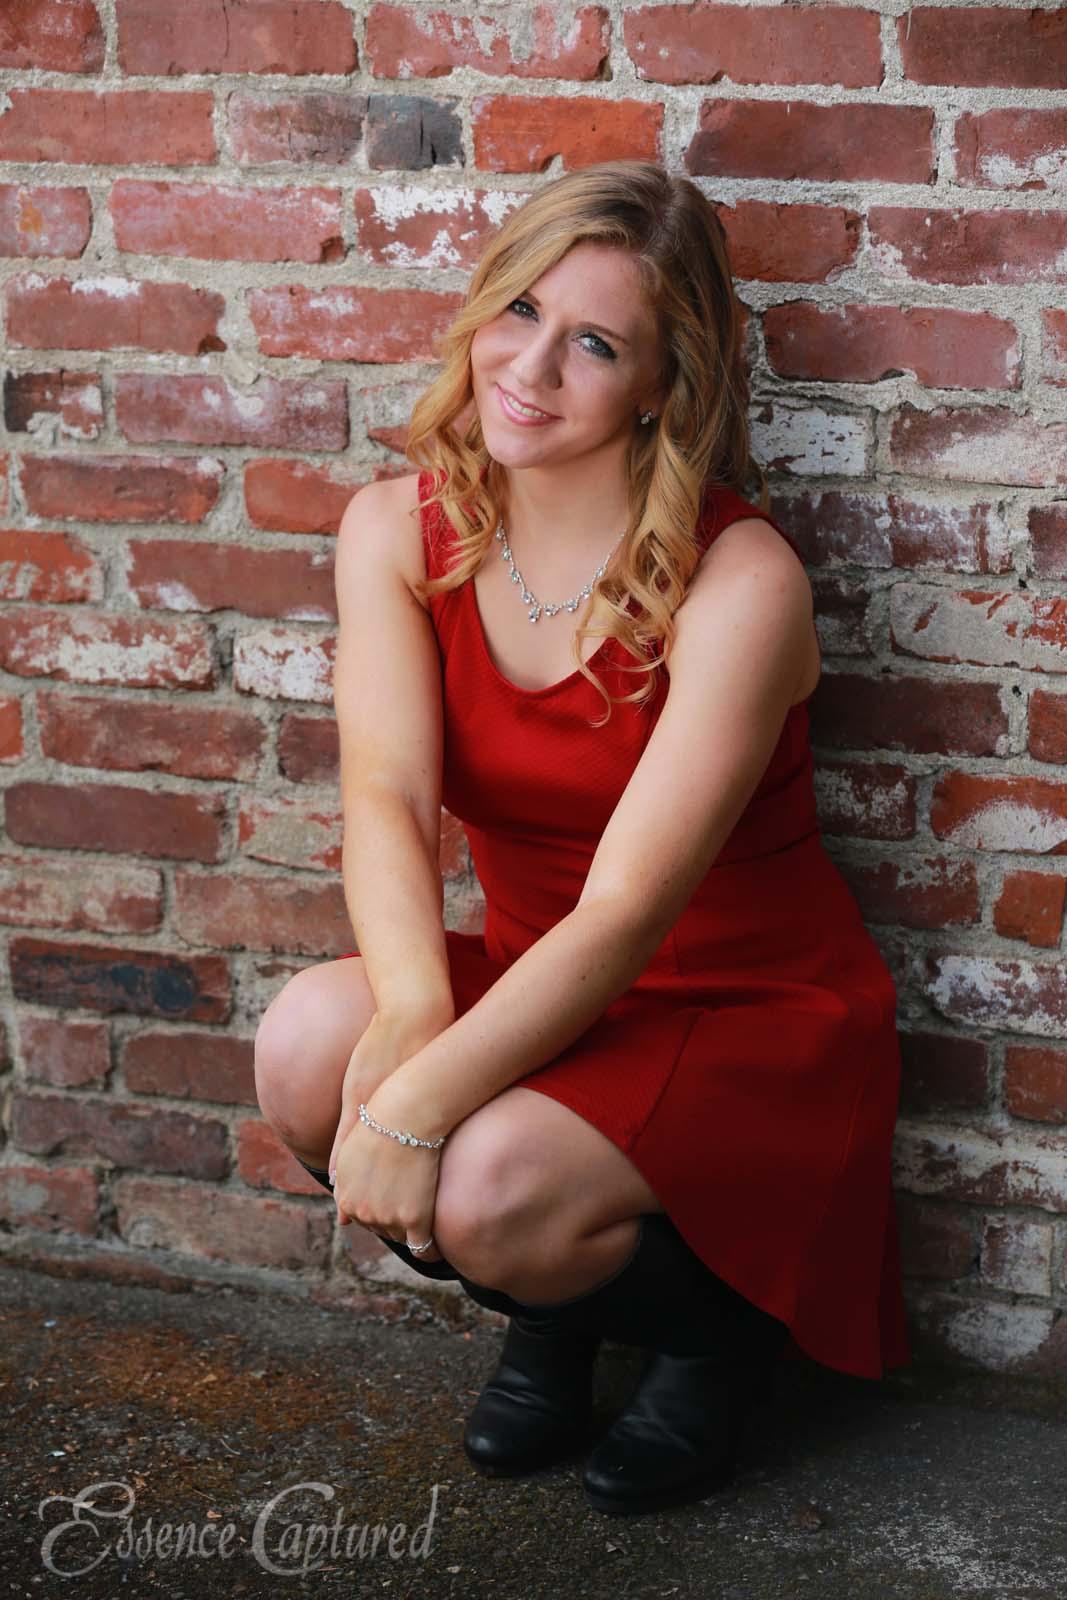 female high school senior portrait red dress long blonde hair brick backdrop